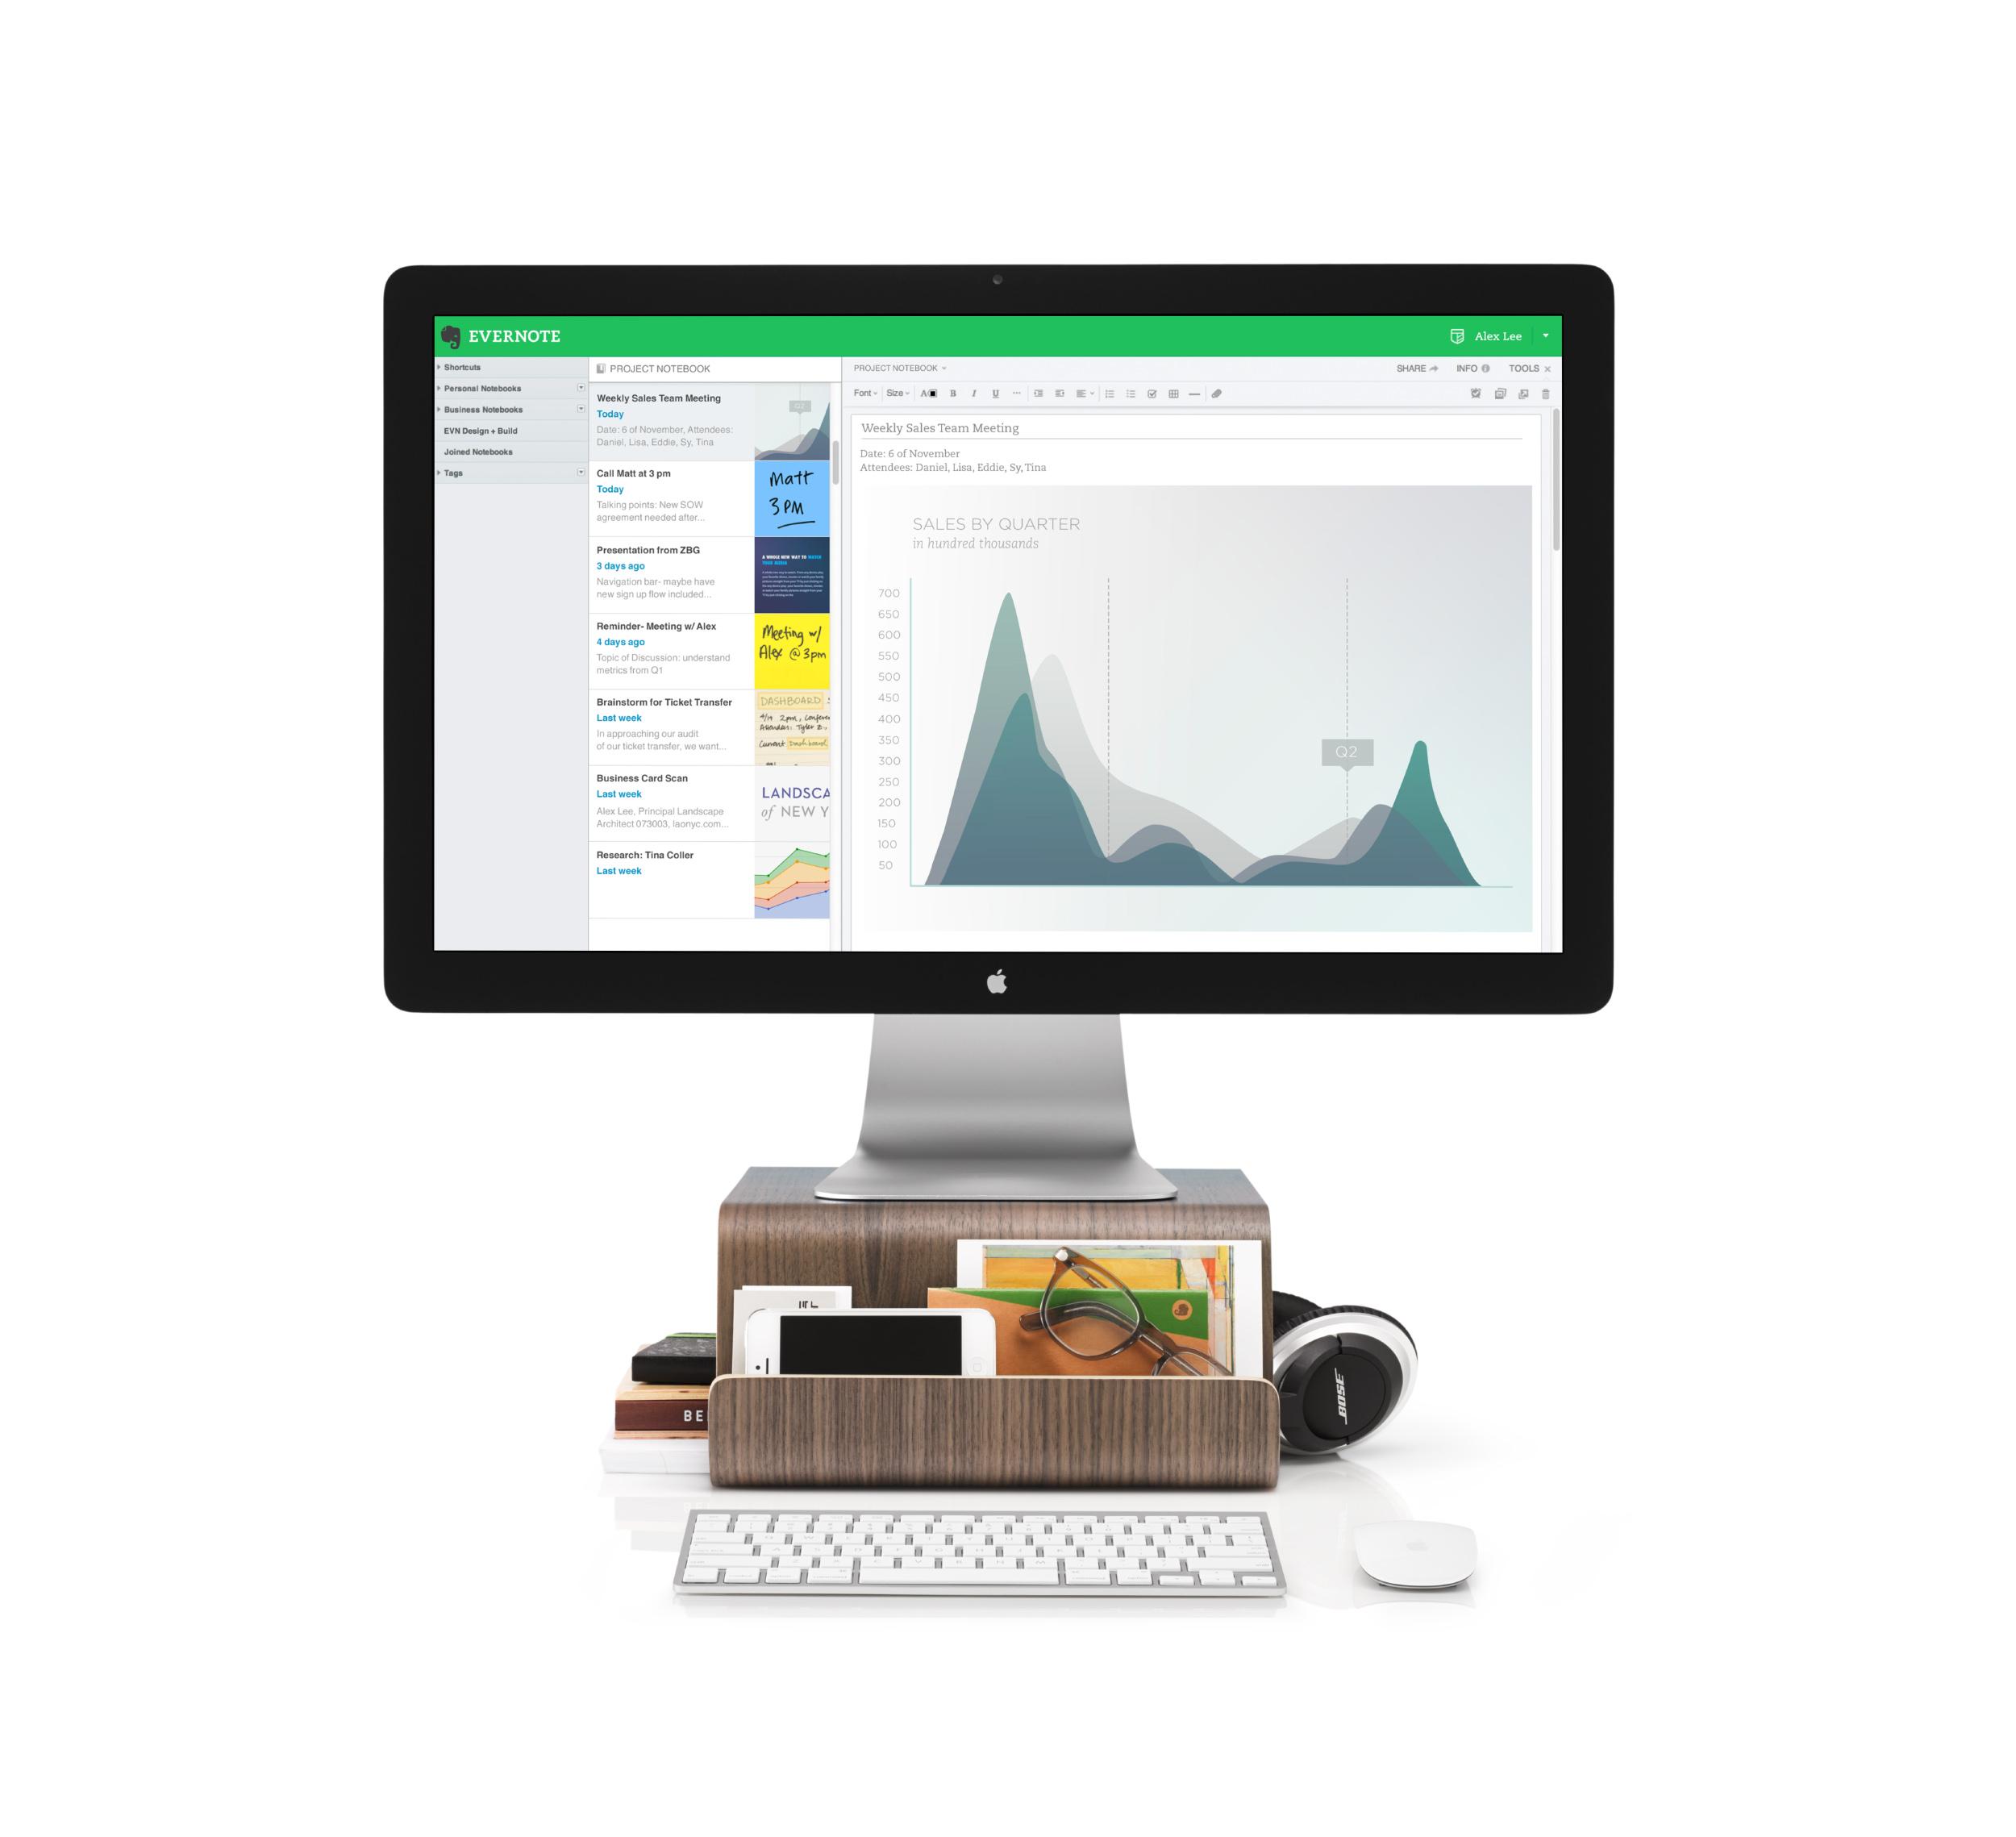 MKT140090_Pfeiffer-BentPly-MonitorStand_HERO_Wood_KT_v1.jpg